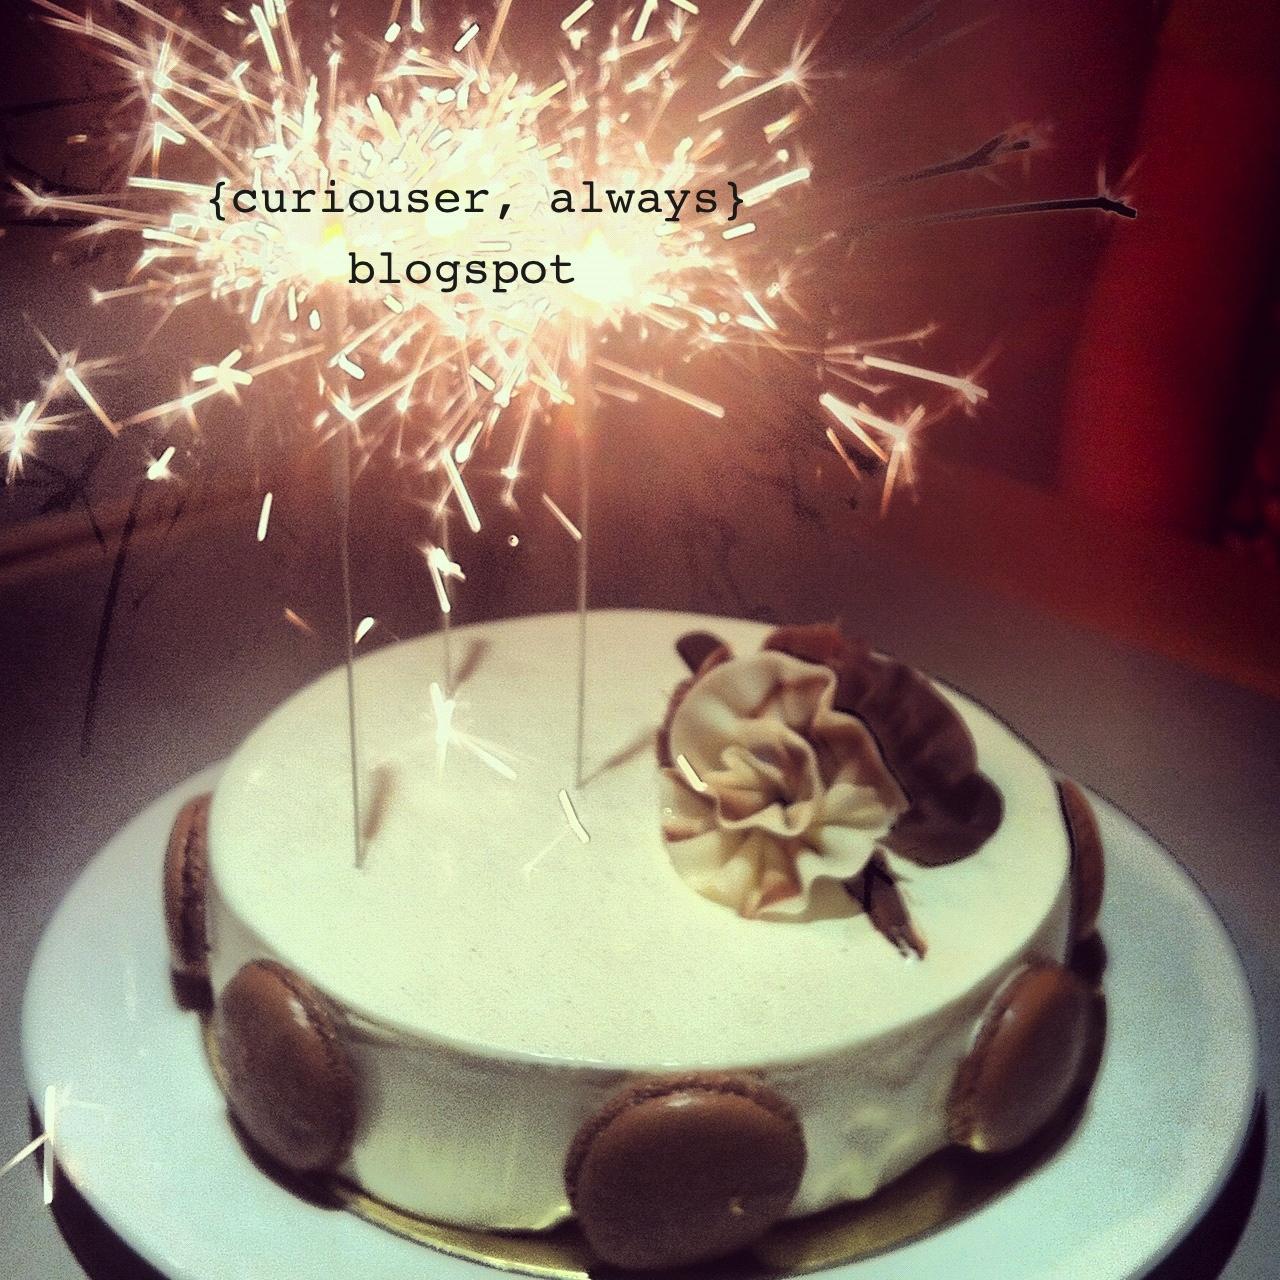 http://4.bp.blogspot.com/-YdPOeu360oQ/T92G9i9Aq-I/AAAAAAAAASc/dSMP4a3uWII/s1600/birthday%2Bcake%2Bfrom%2BLe%2BBon%2BChoix.jpg